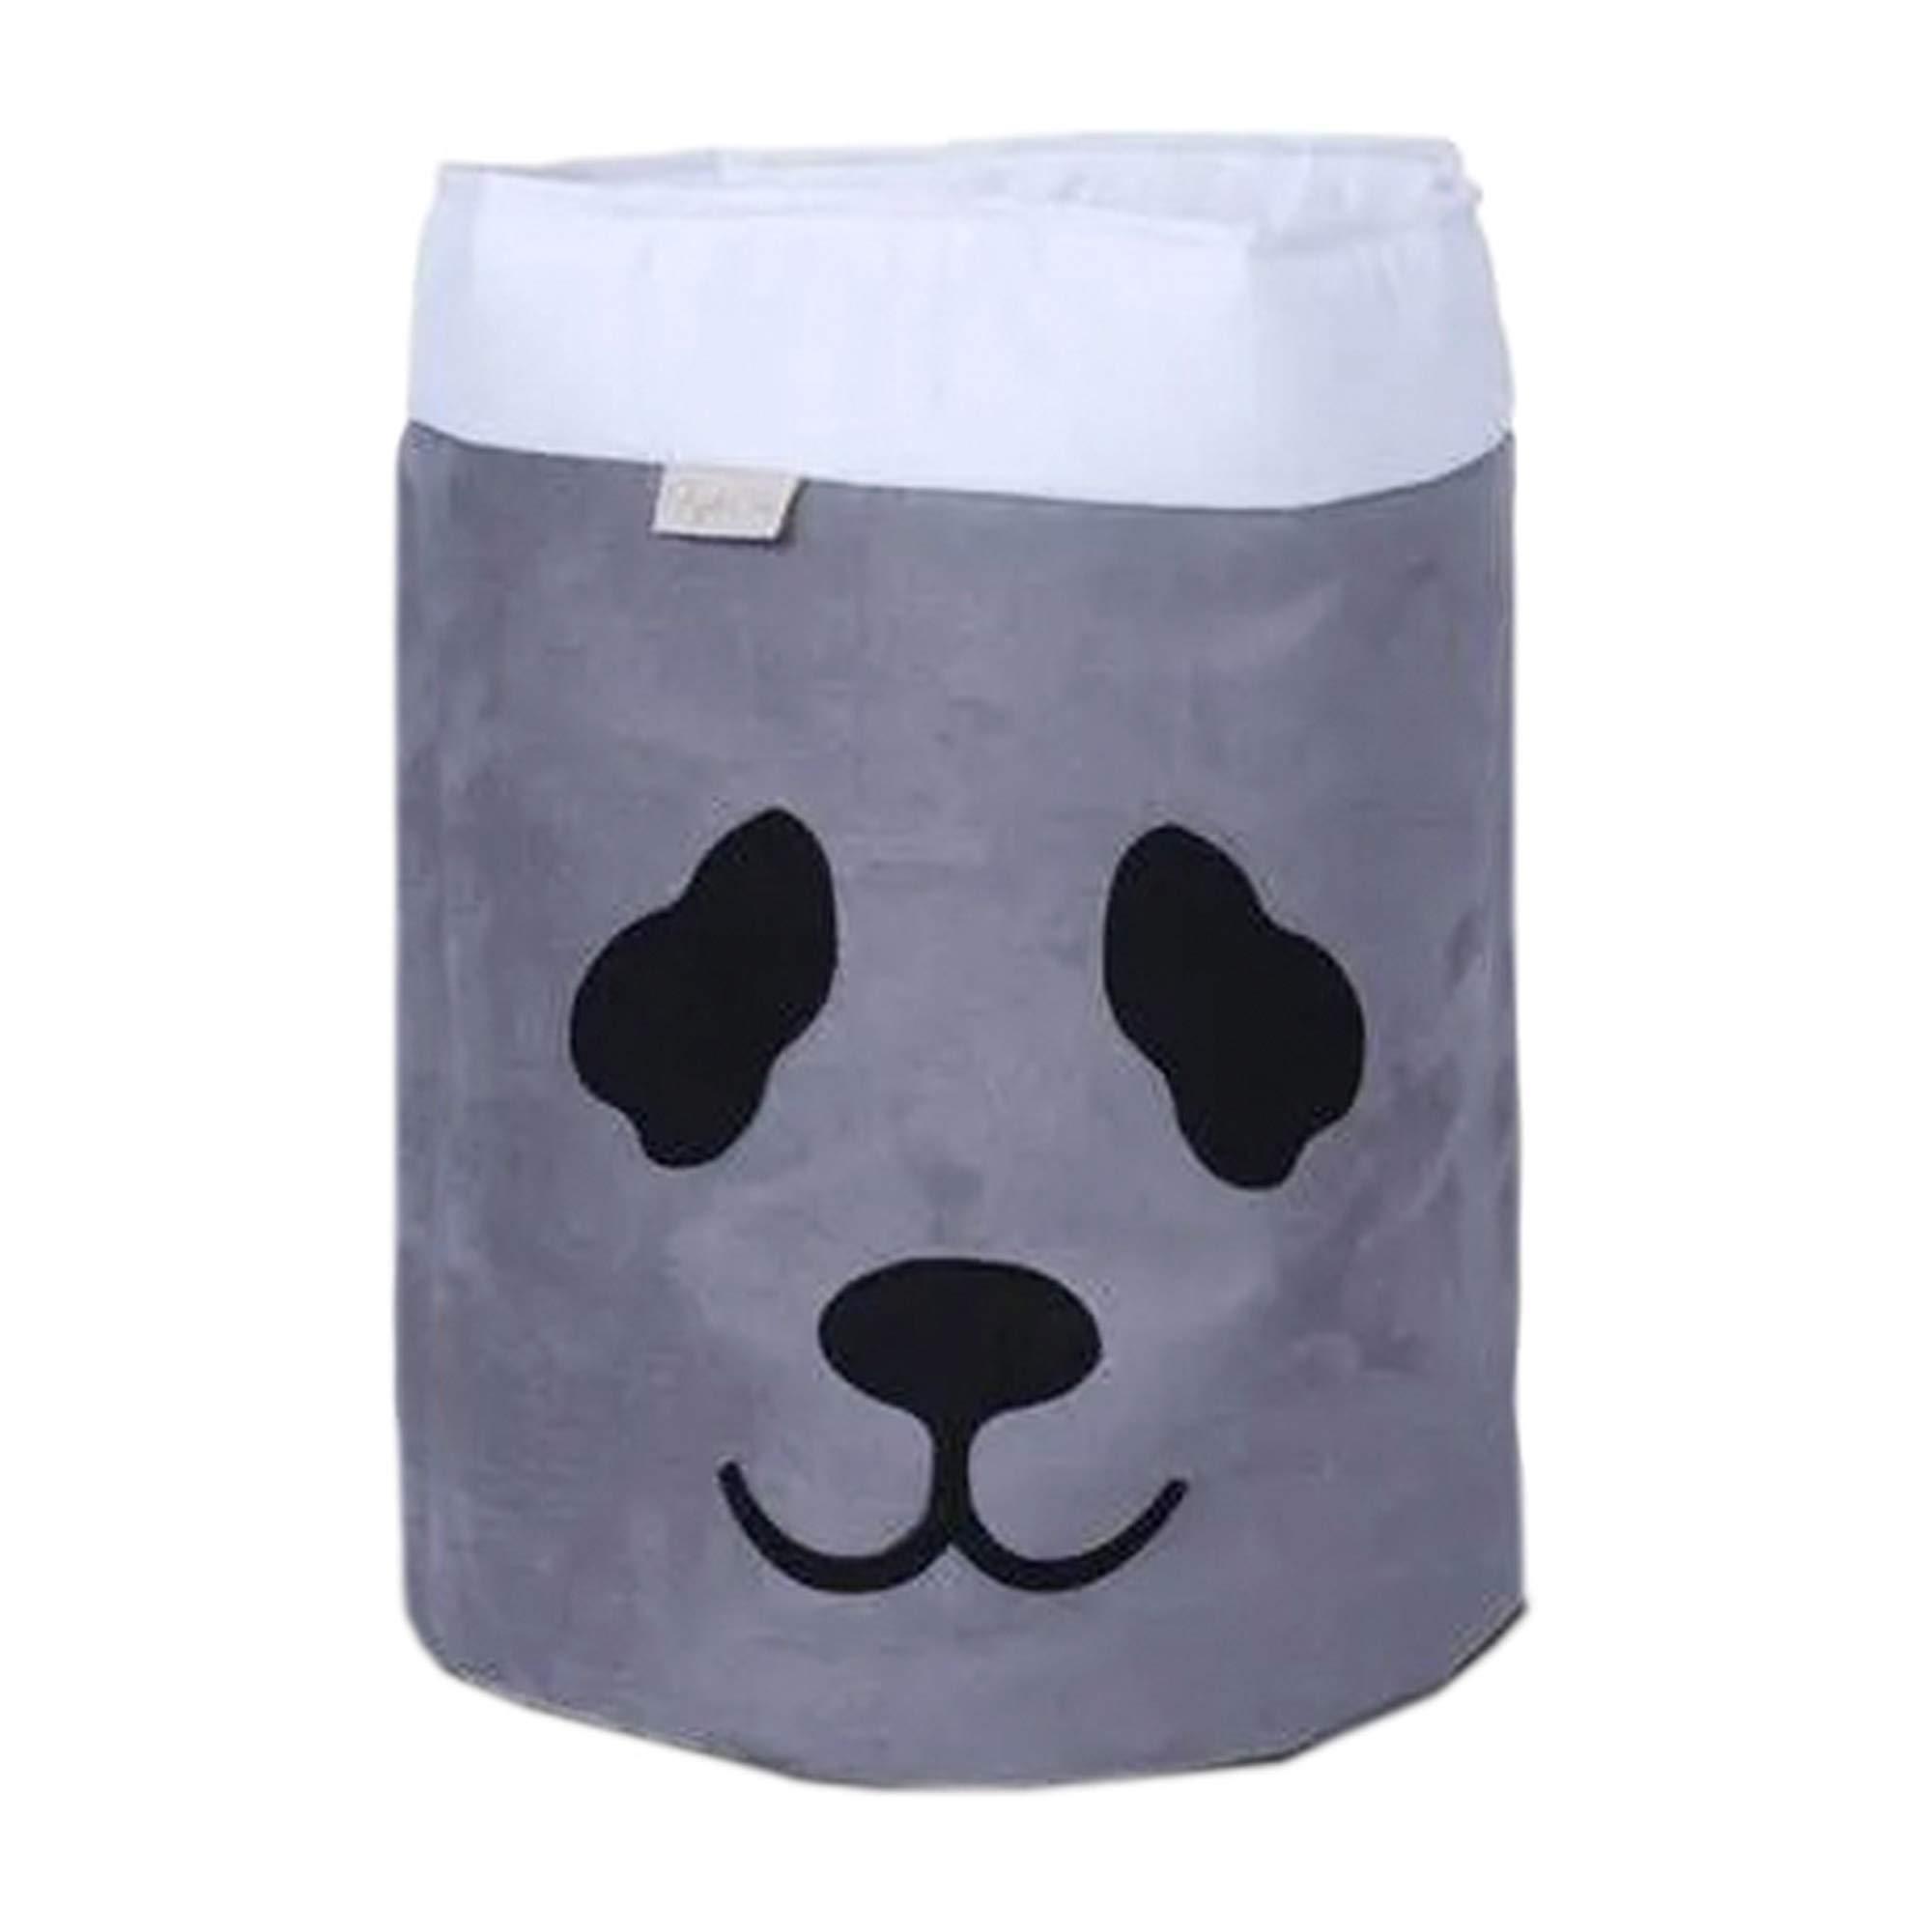 Cesto Organizador Para Brinquedos Panda Cinza com Cru